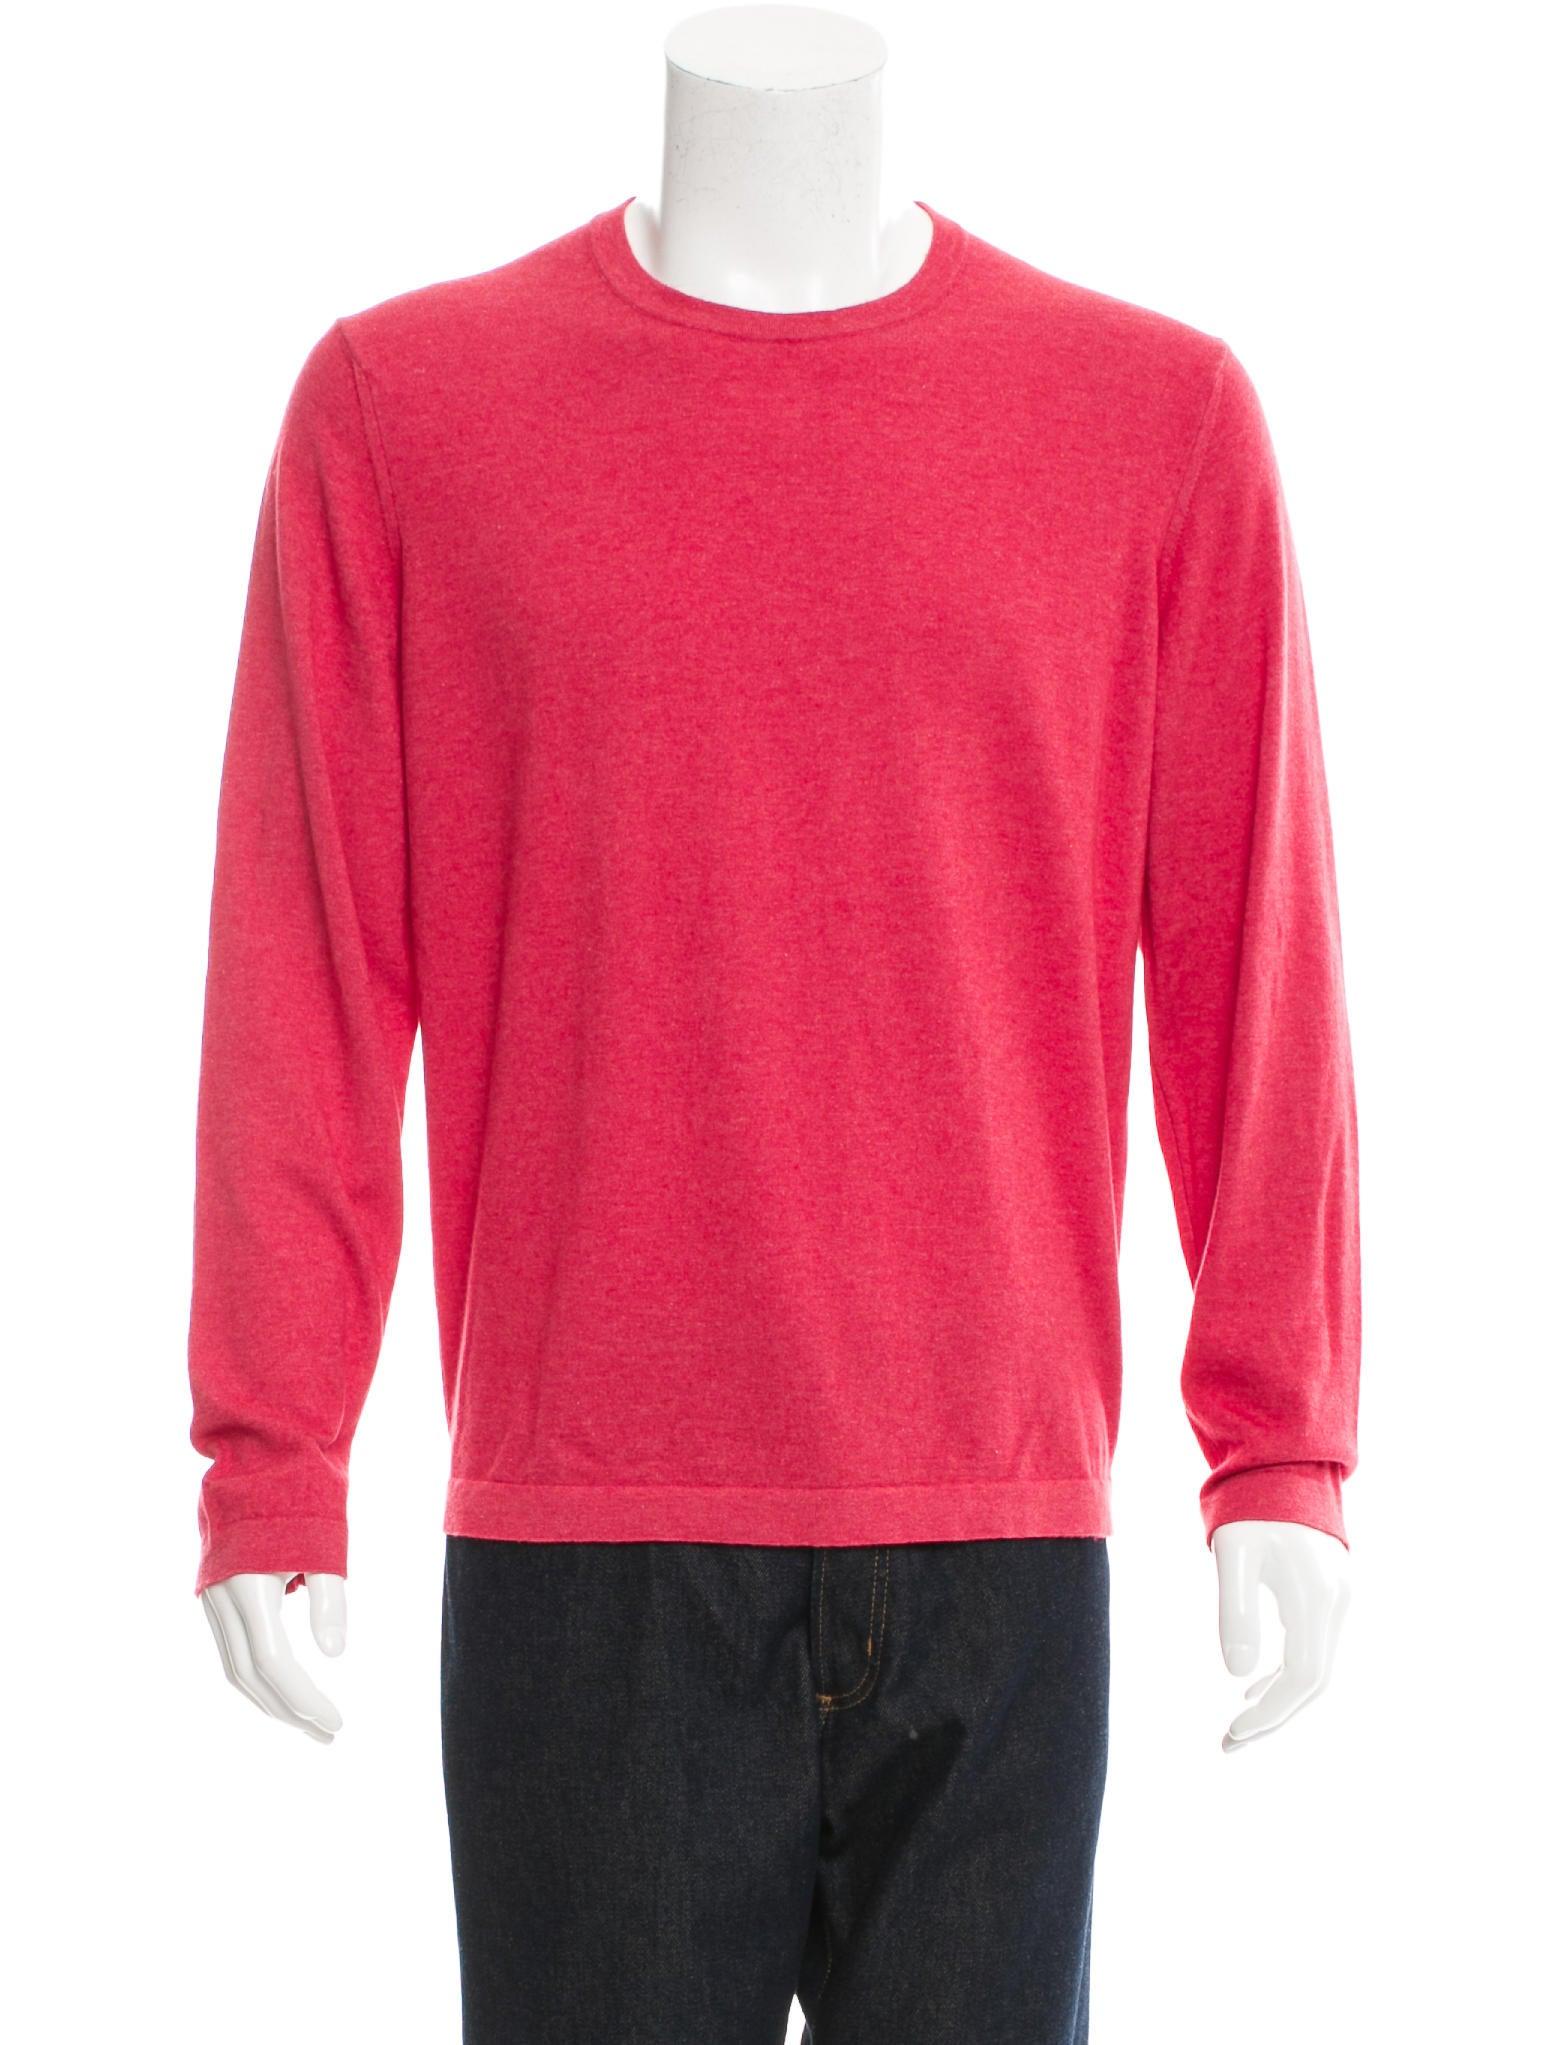 New Listing Vince Cashmere Blend Knit Turtleneck Sweater Tunic Sleeveless Gray Stretch Sz L Long, tunic length cashmere blend turtleneck sleeveless sweater. Reverse seem down center back.